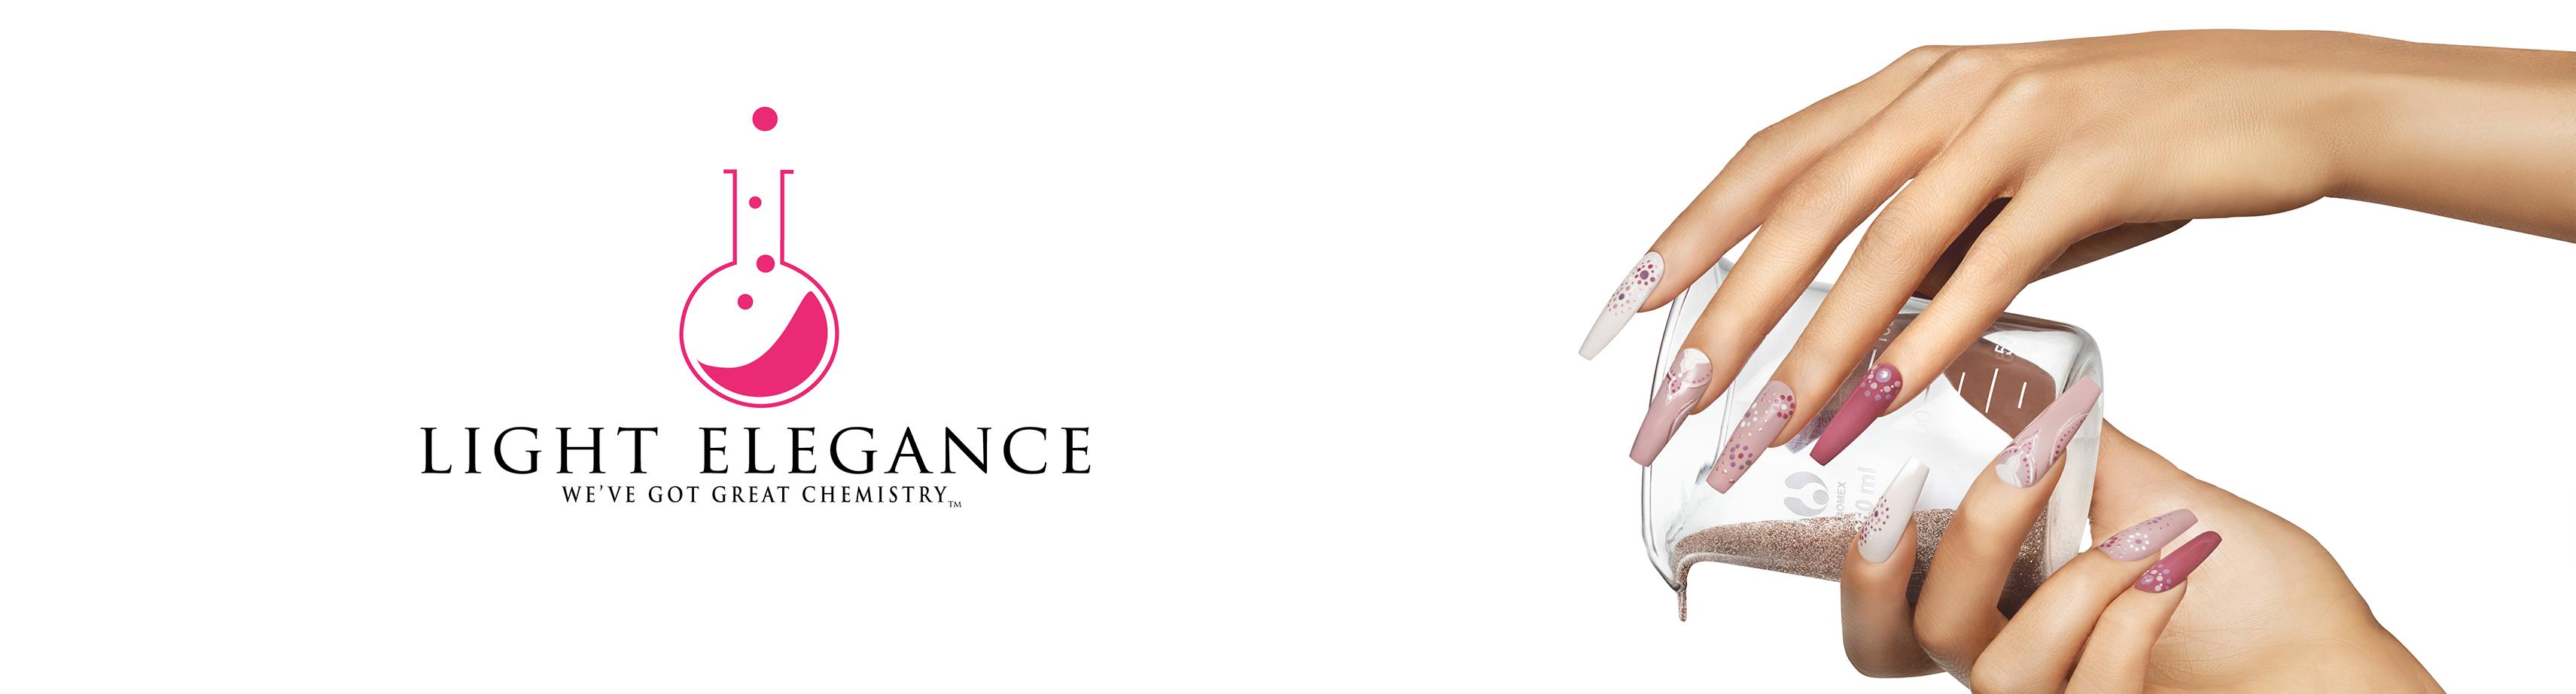 dk-beauty-light-elegance-banner.png